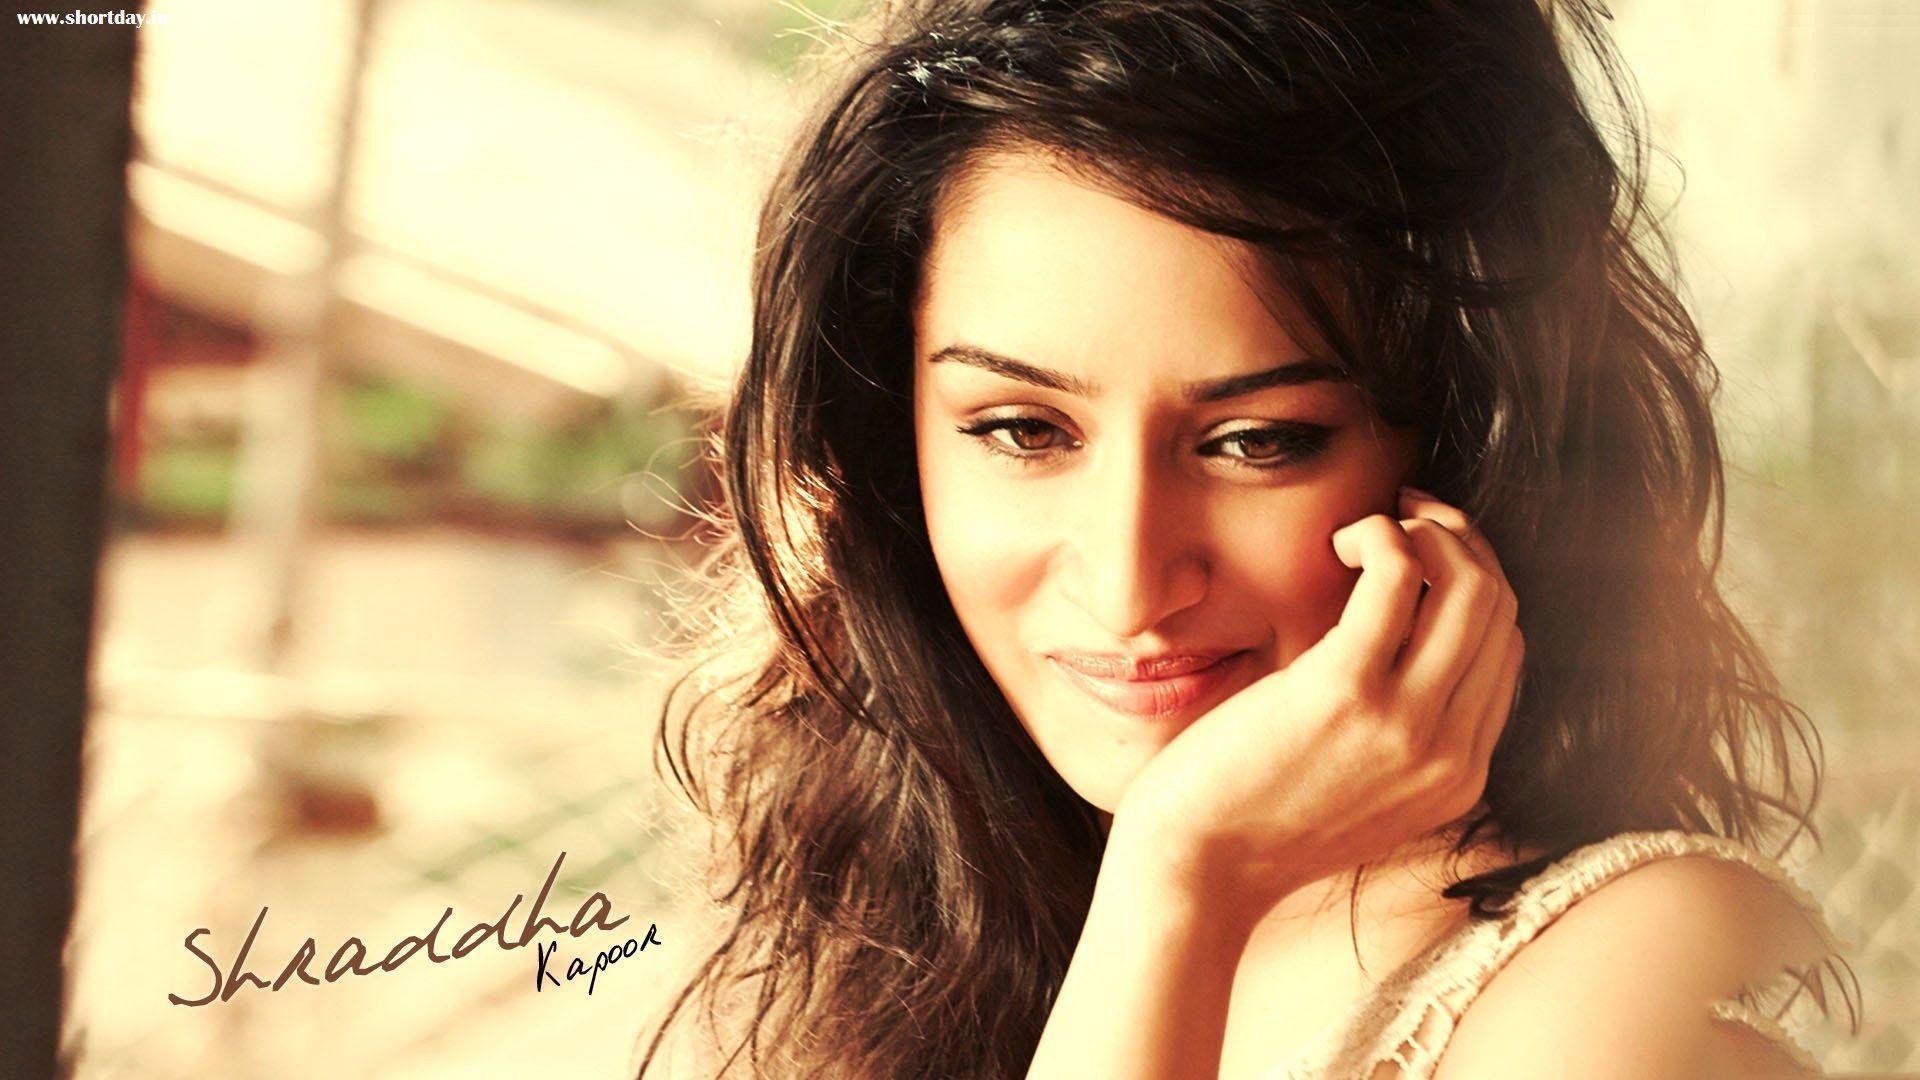 Shraddha Kapoor Full HD 1080p Wallpapers Images Pics Photos ... Download